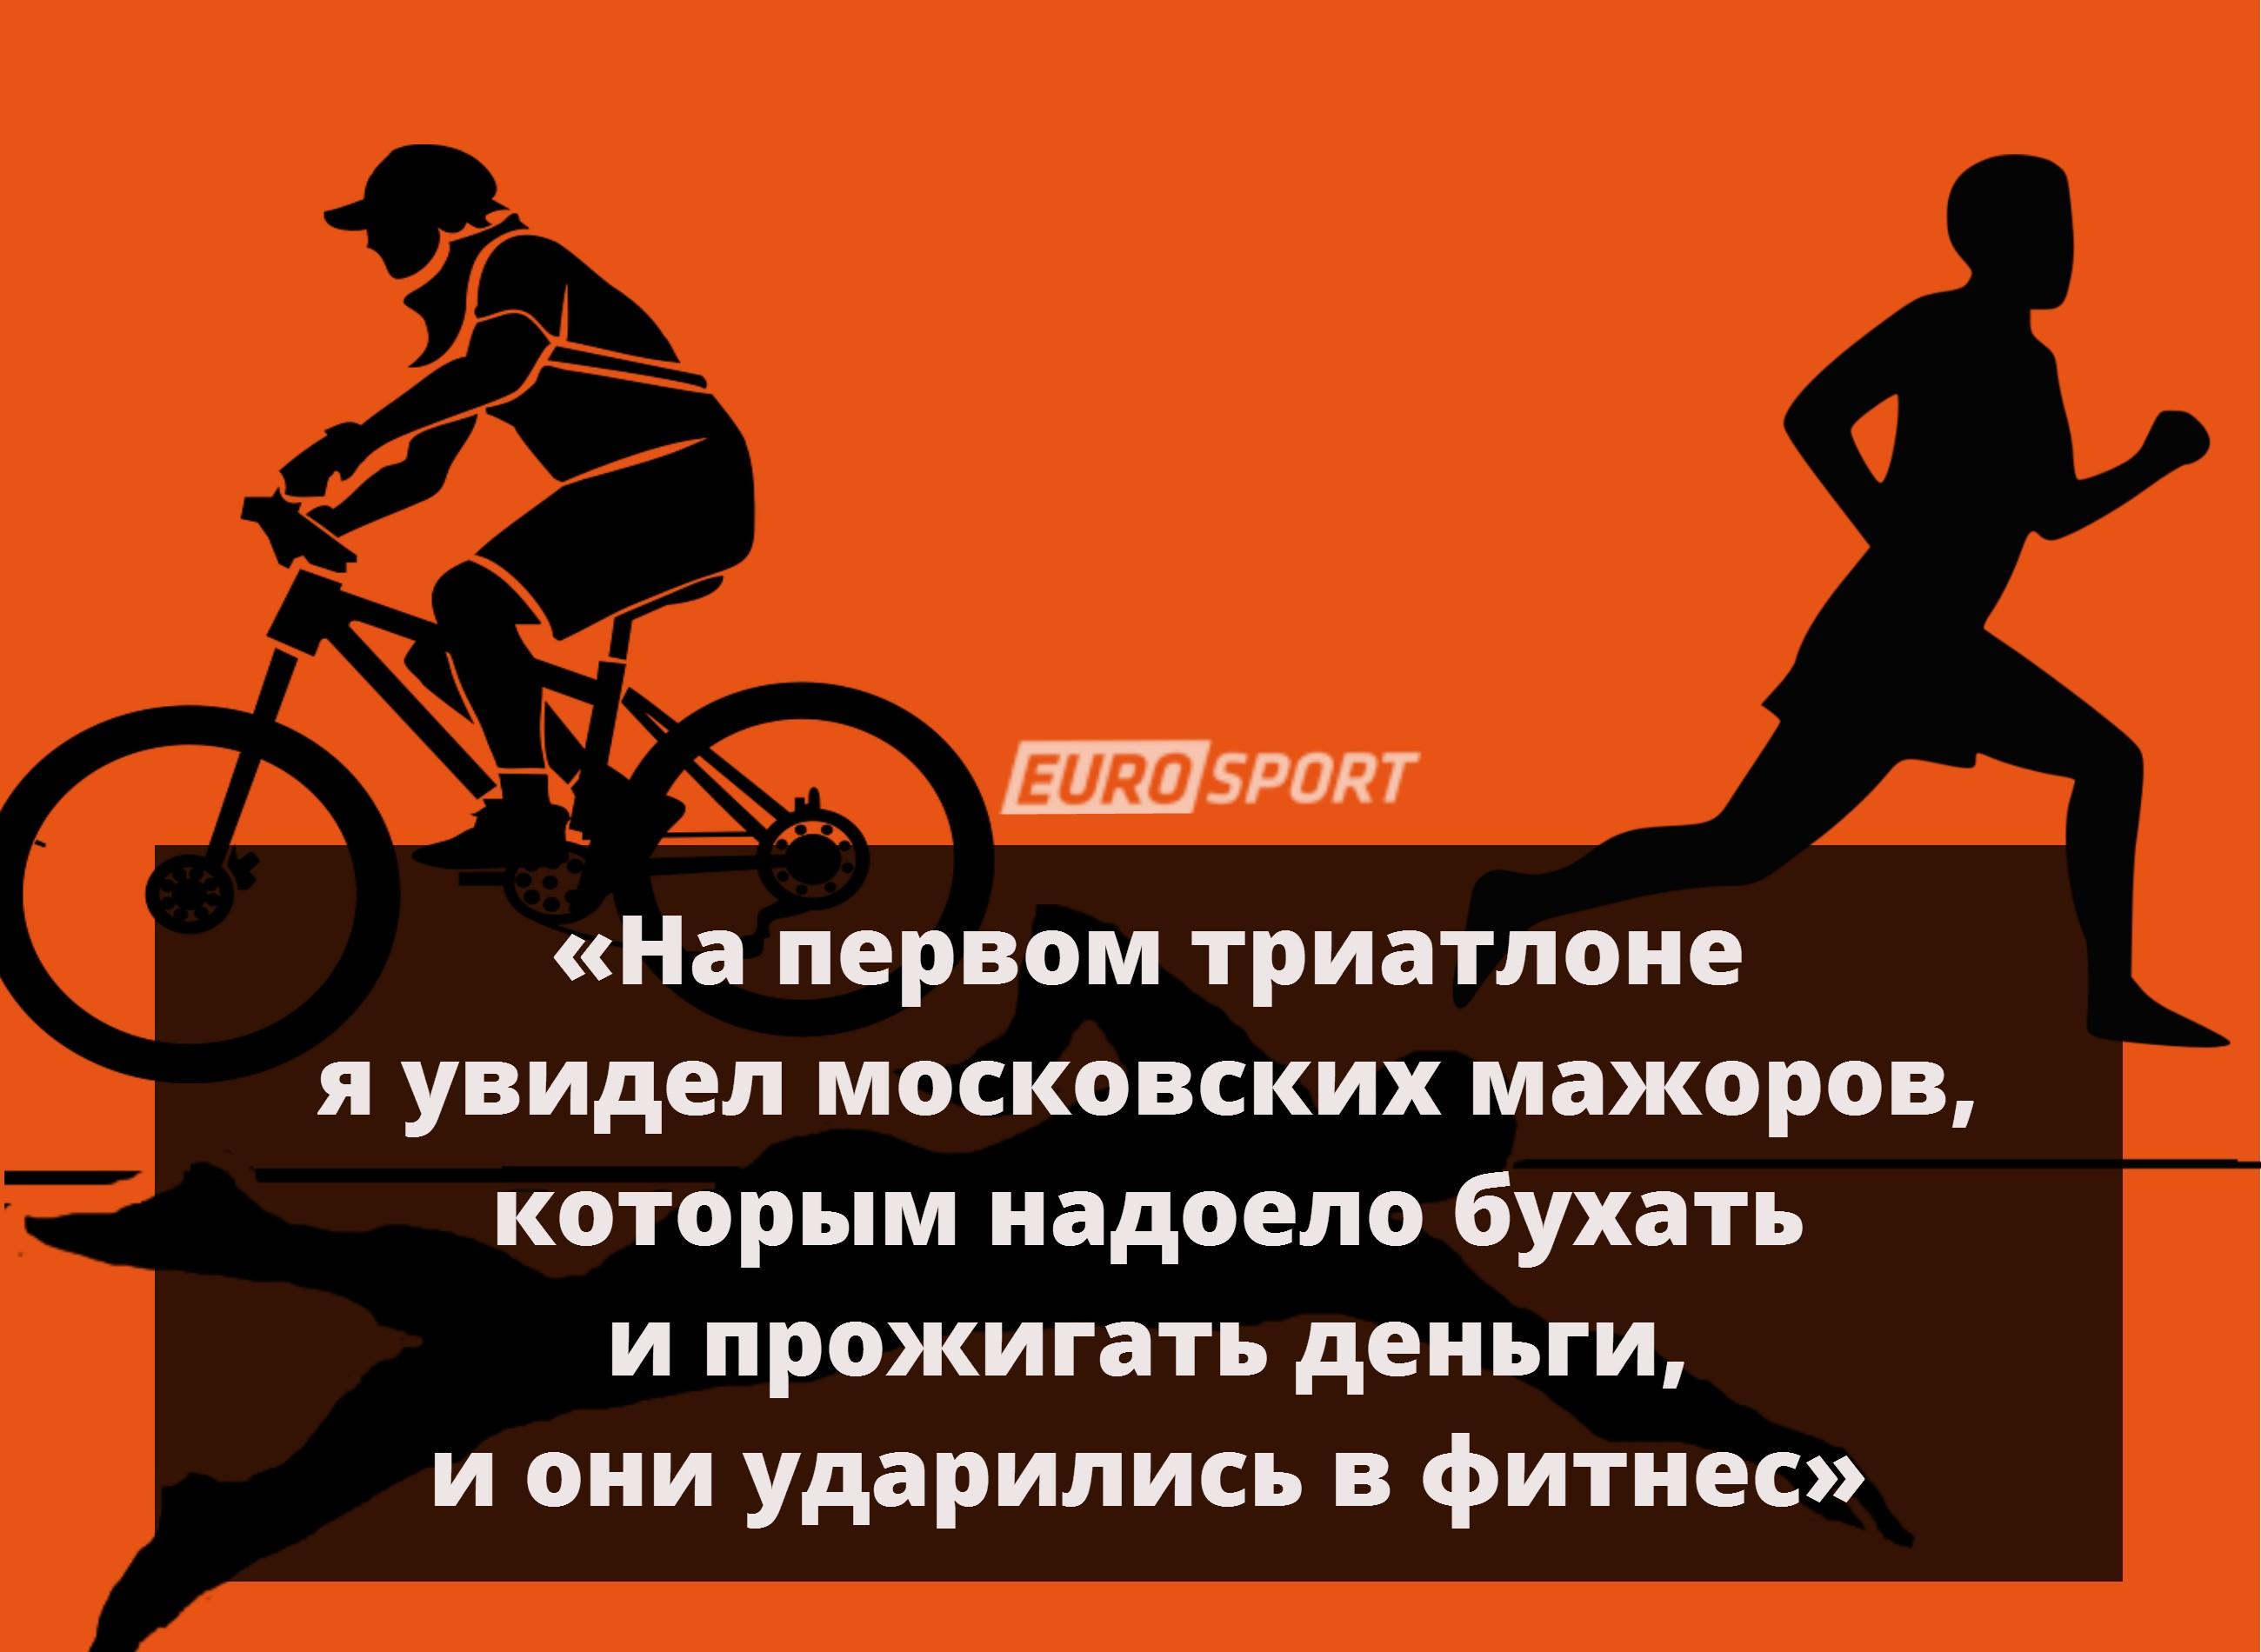 https://i.eurosport.com/2015/05/22/1567545.jpg